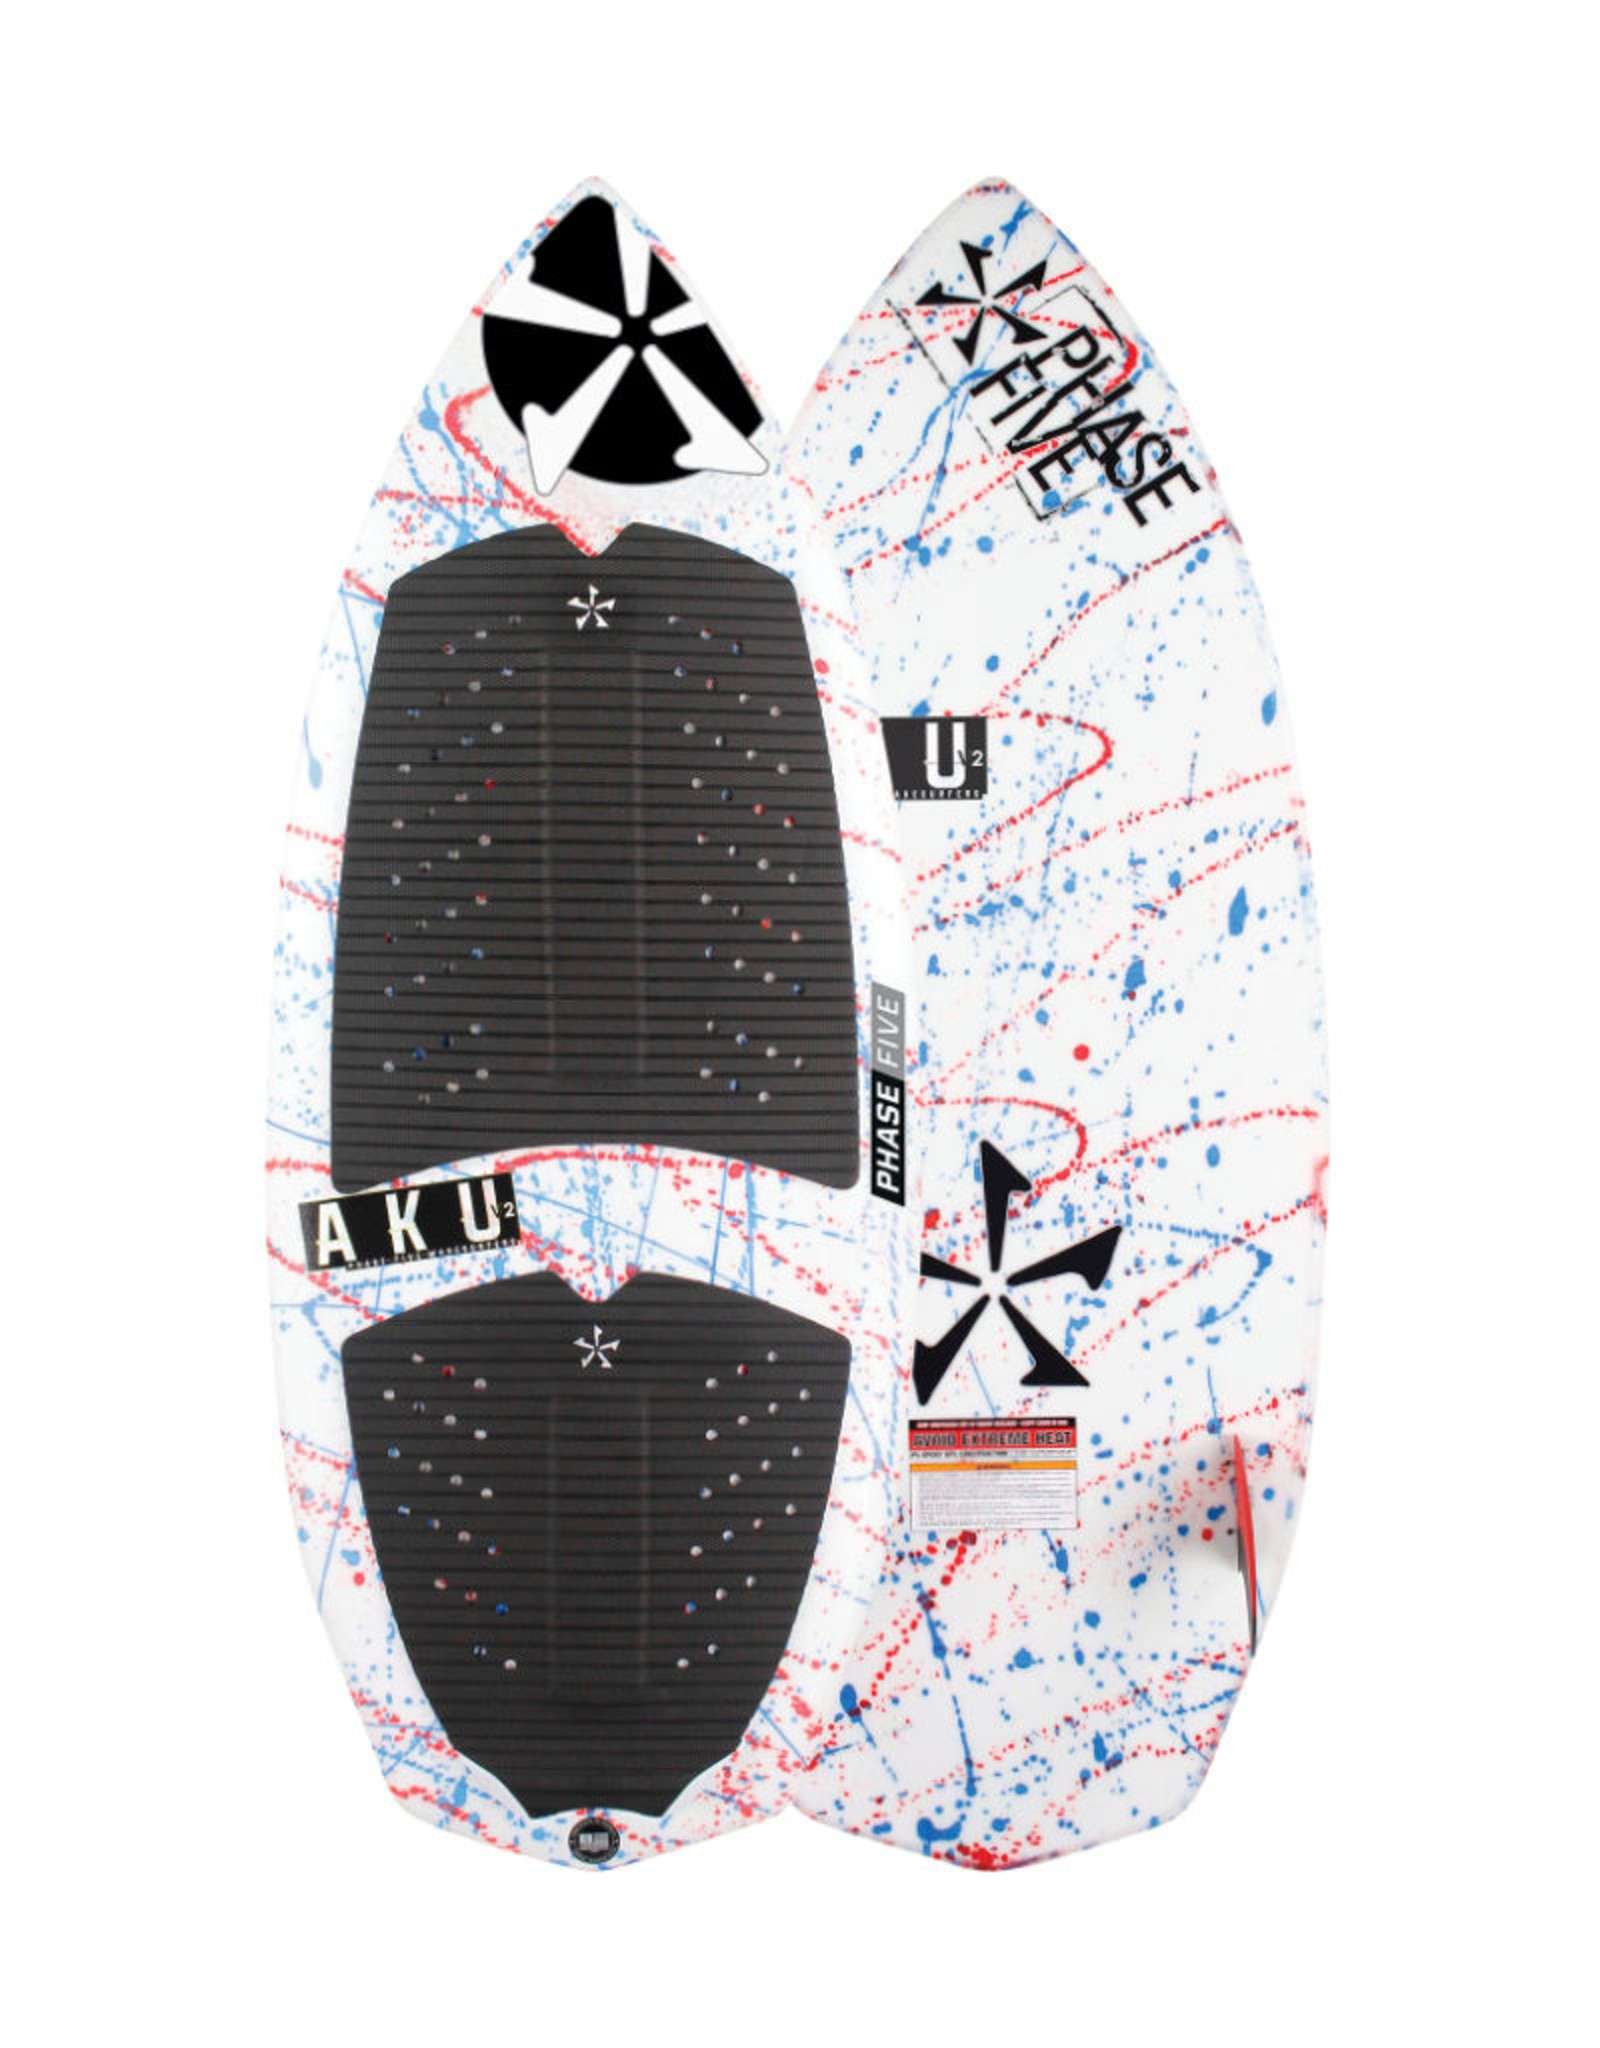 "Phase Five Phase Five Aku V2 53"" Surf Style Wakesurf"